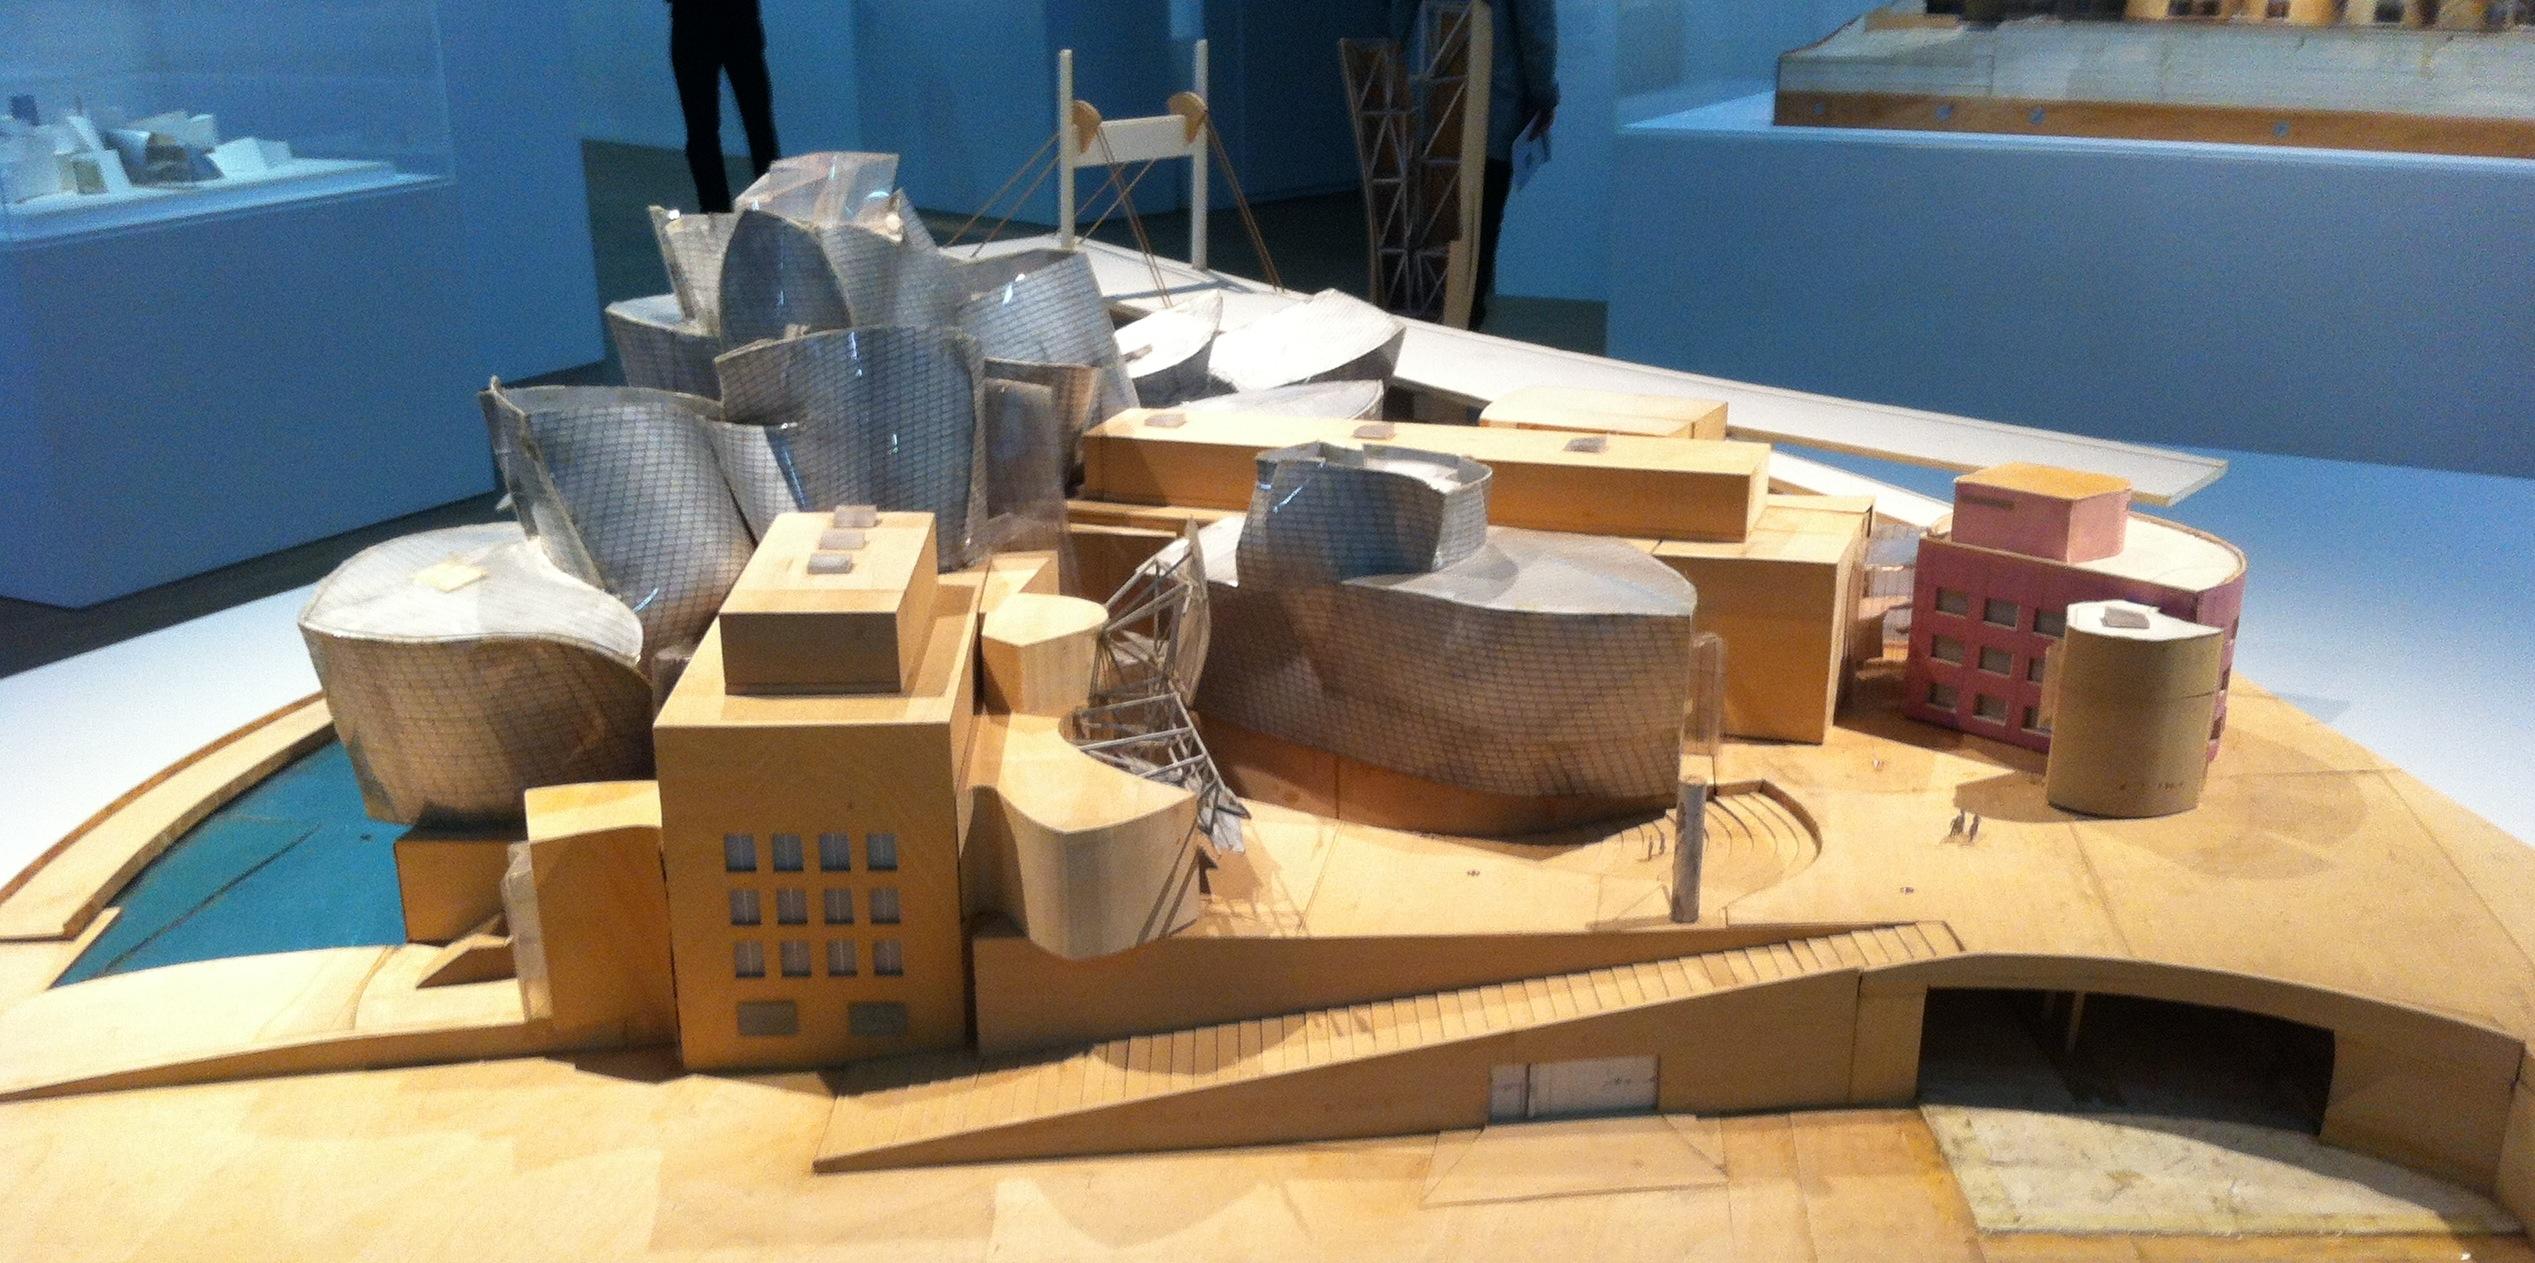 Musée Guggenheim (Bilbao, Espagne), 1991-1997.